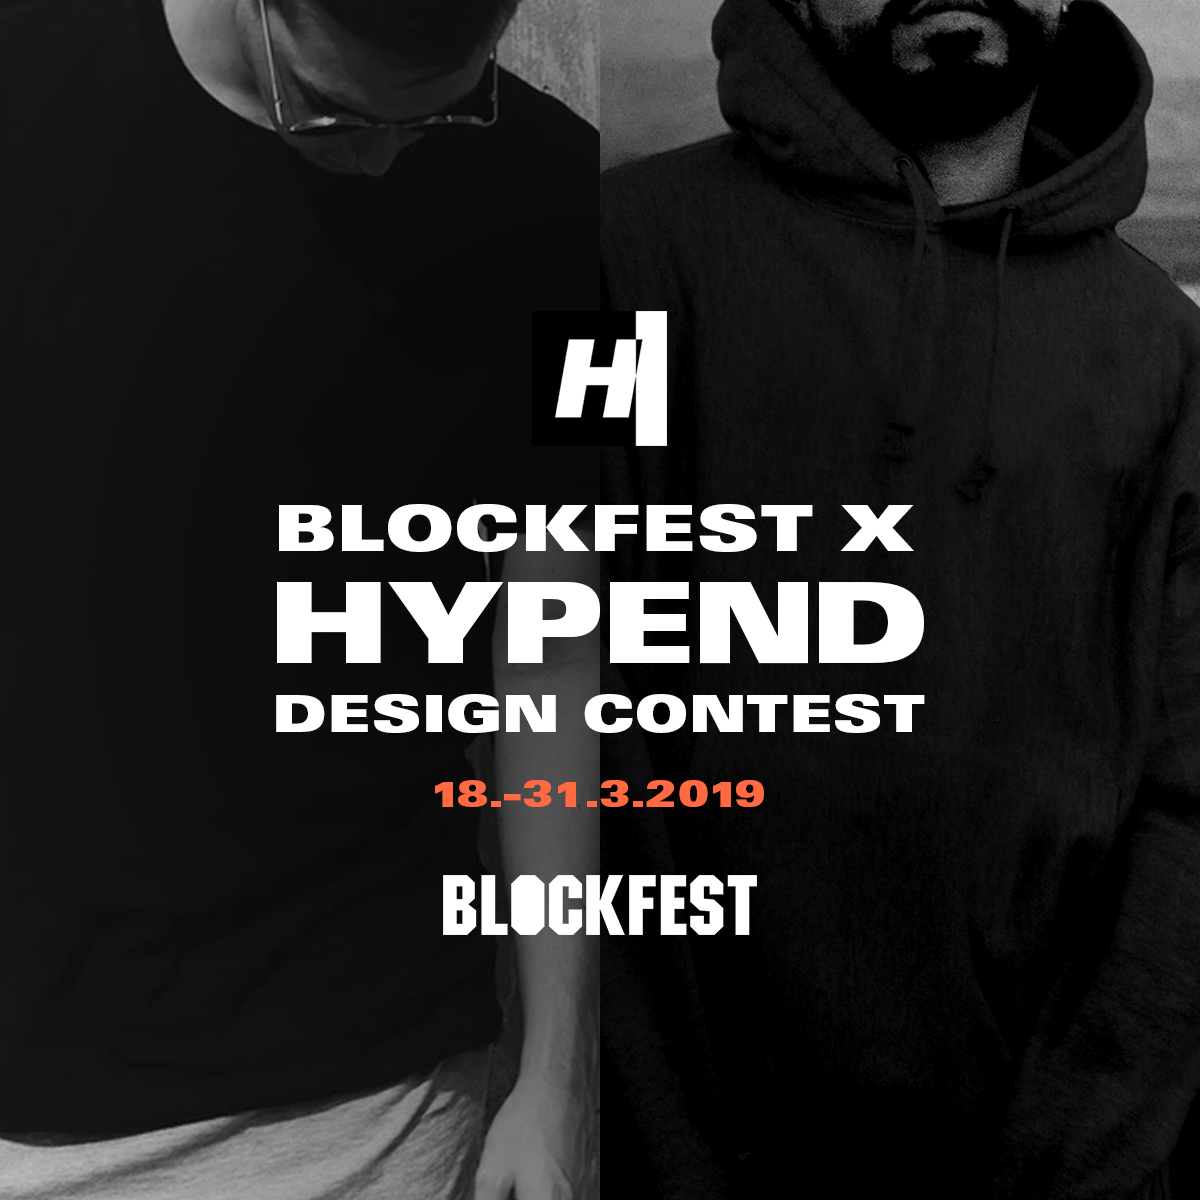 HypendXBlockfest